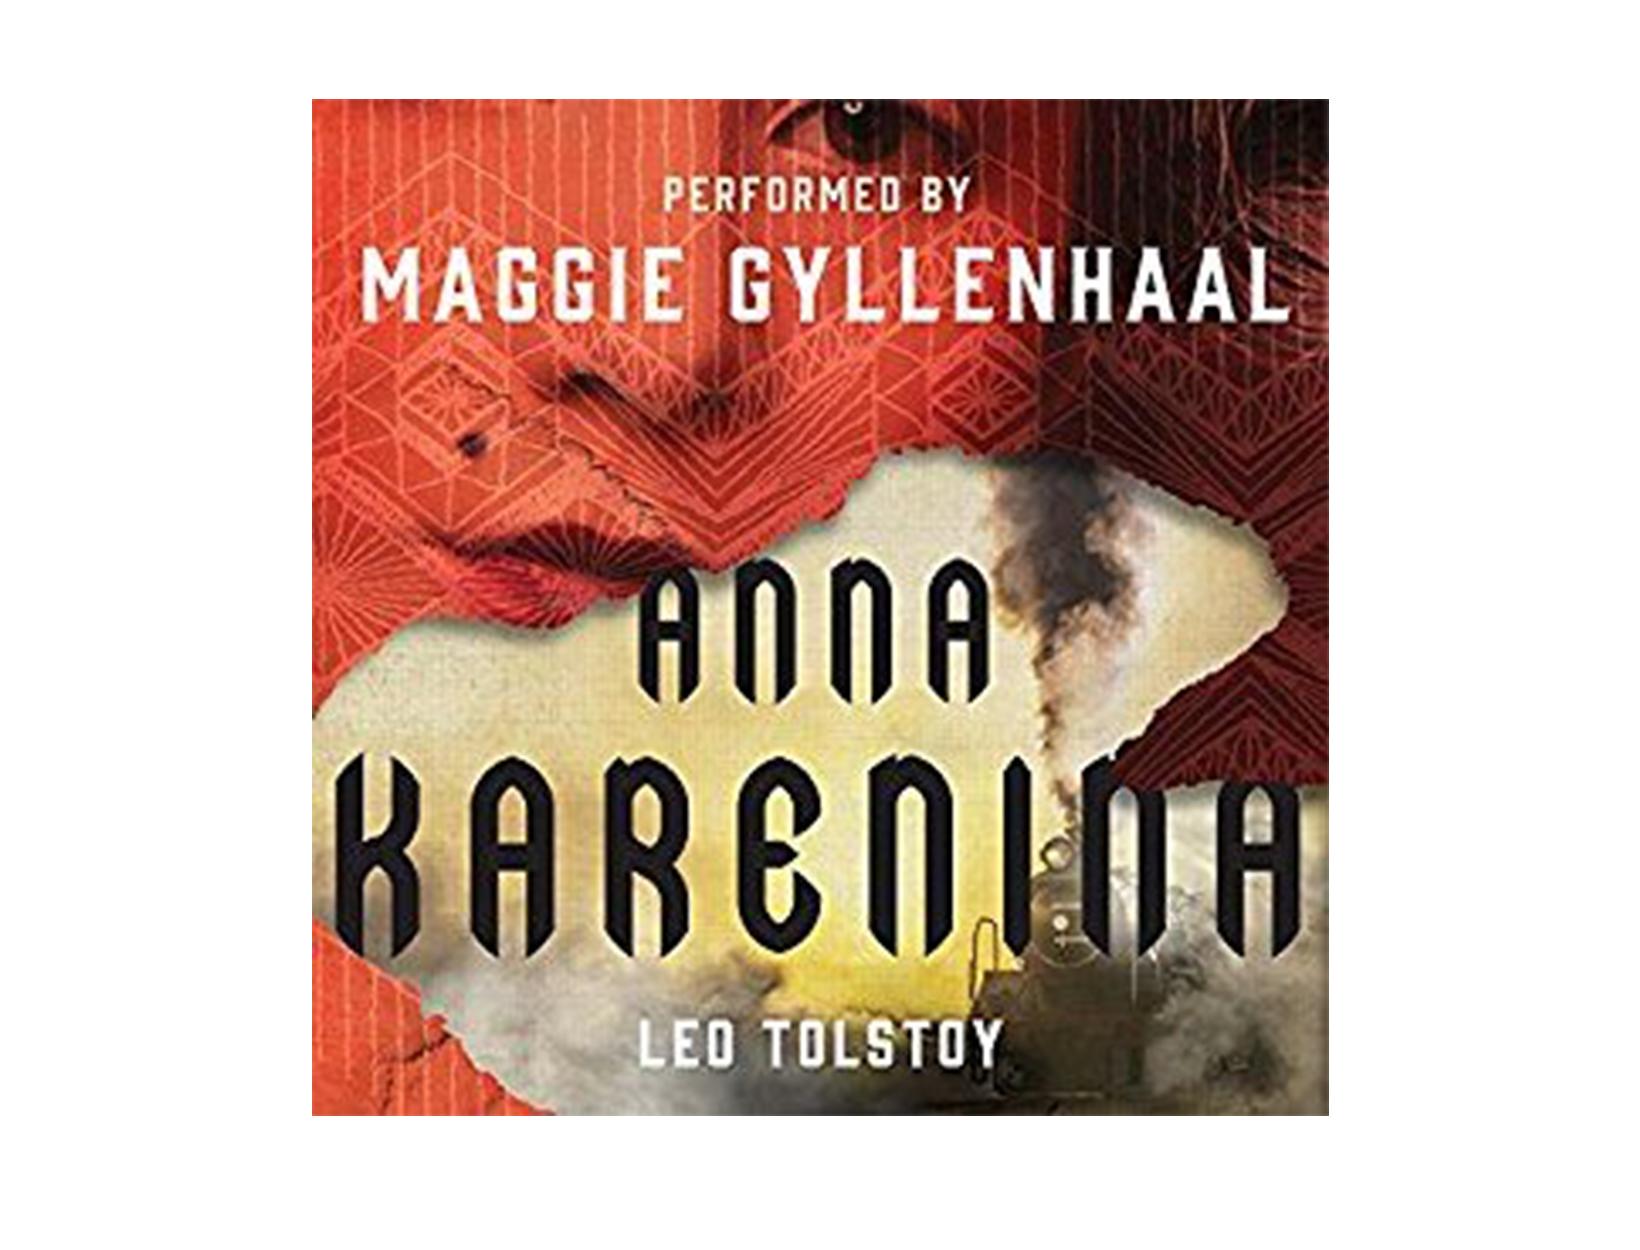 Anna Karenina by Leo Tolstoy, read by Maggie Gyllenhaal